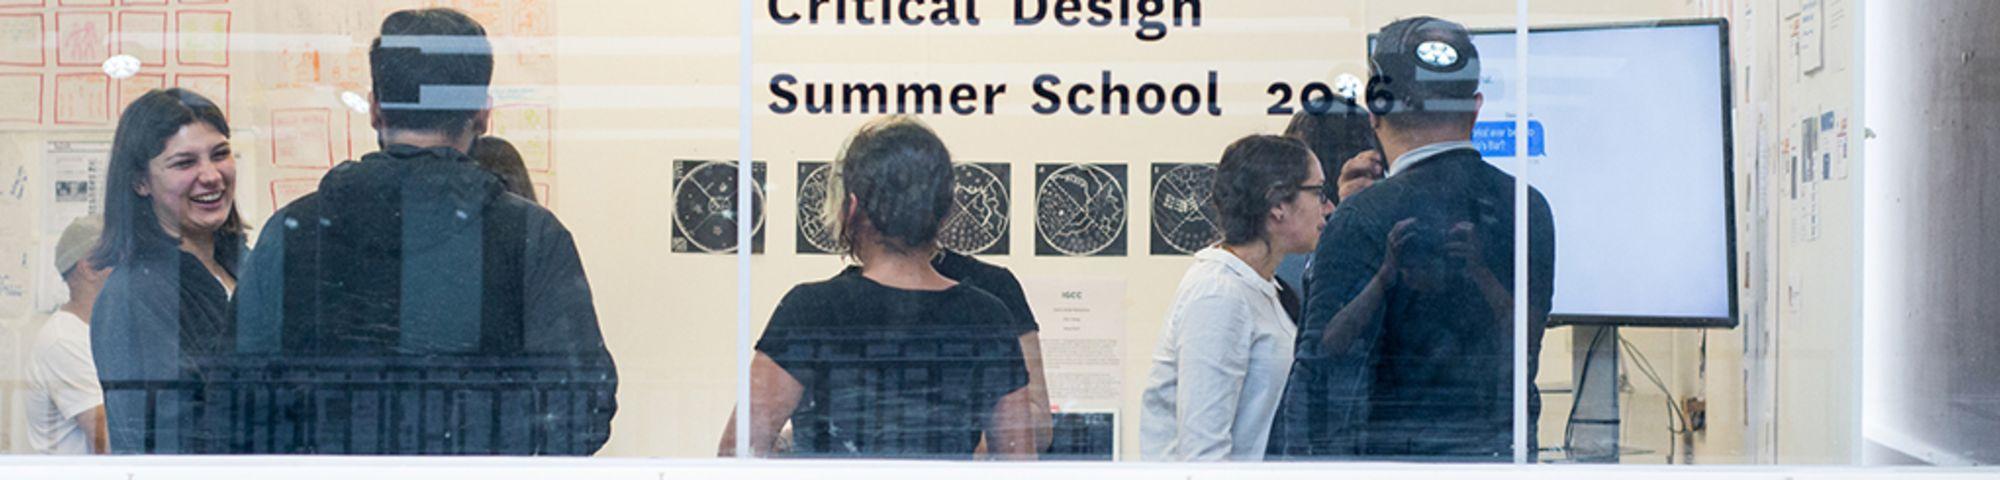 Speculative and critical design summer school 2016